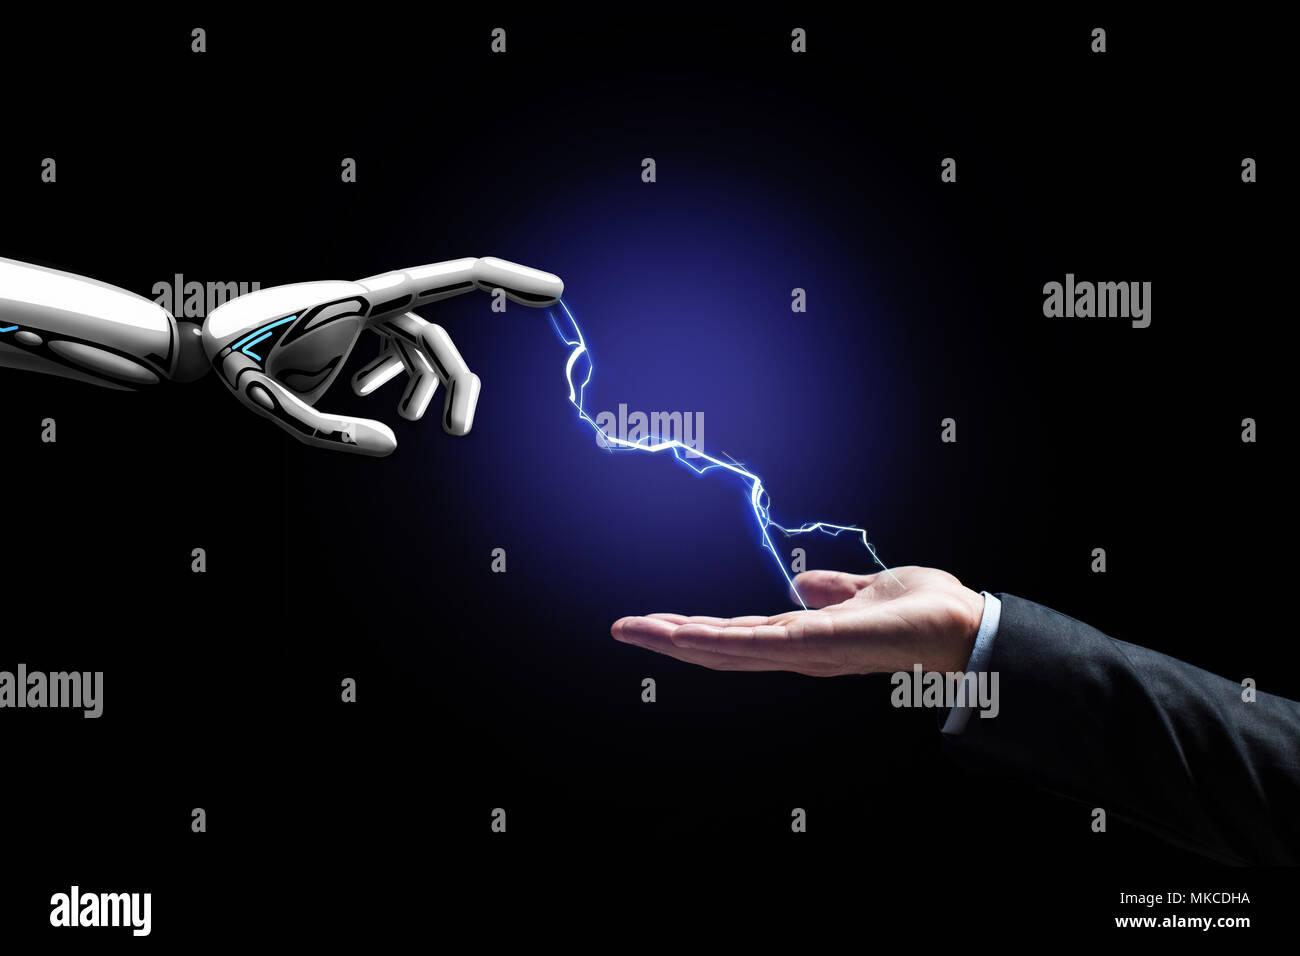 Roboter und Menschen durch Blitzschlag angeschlossen Stockbild